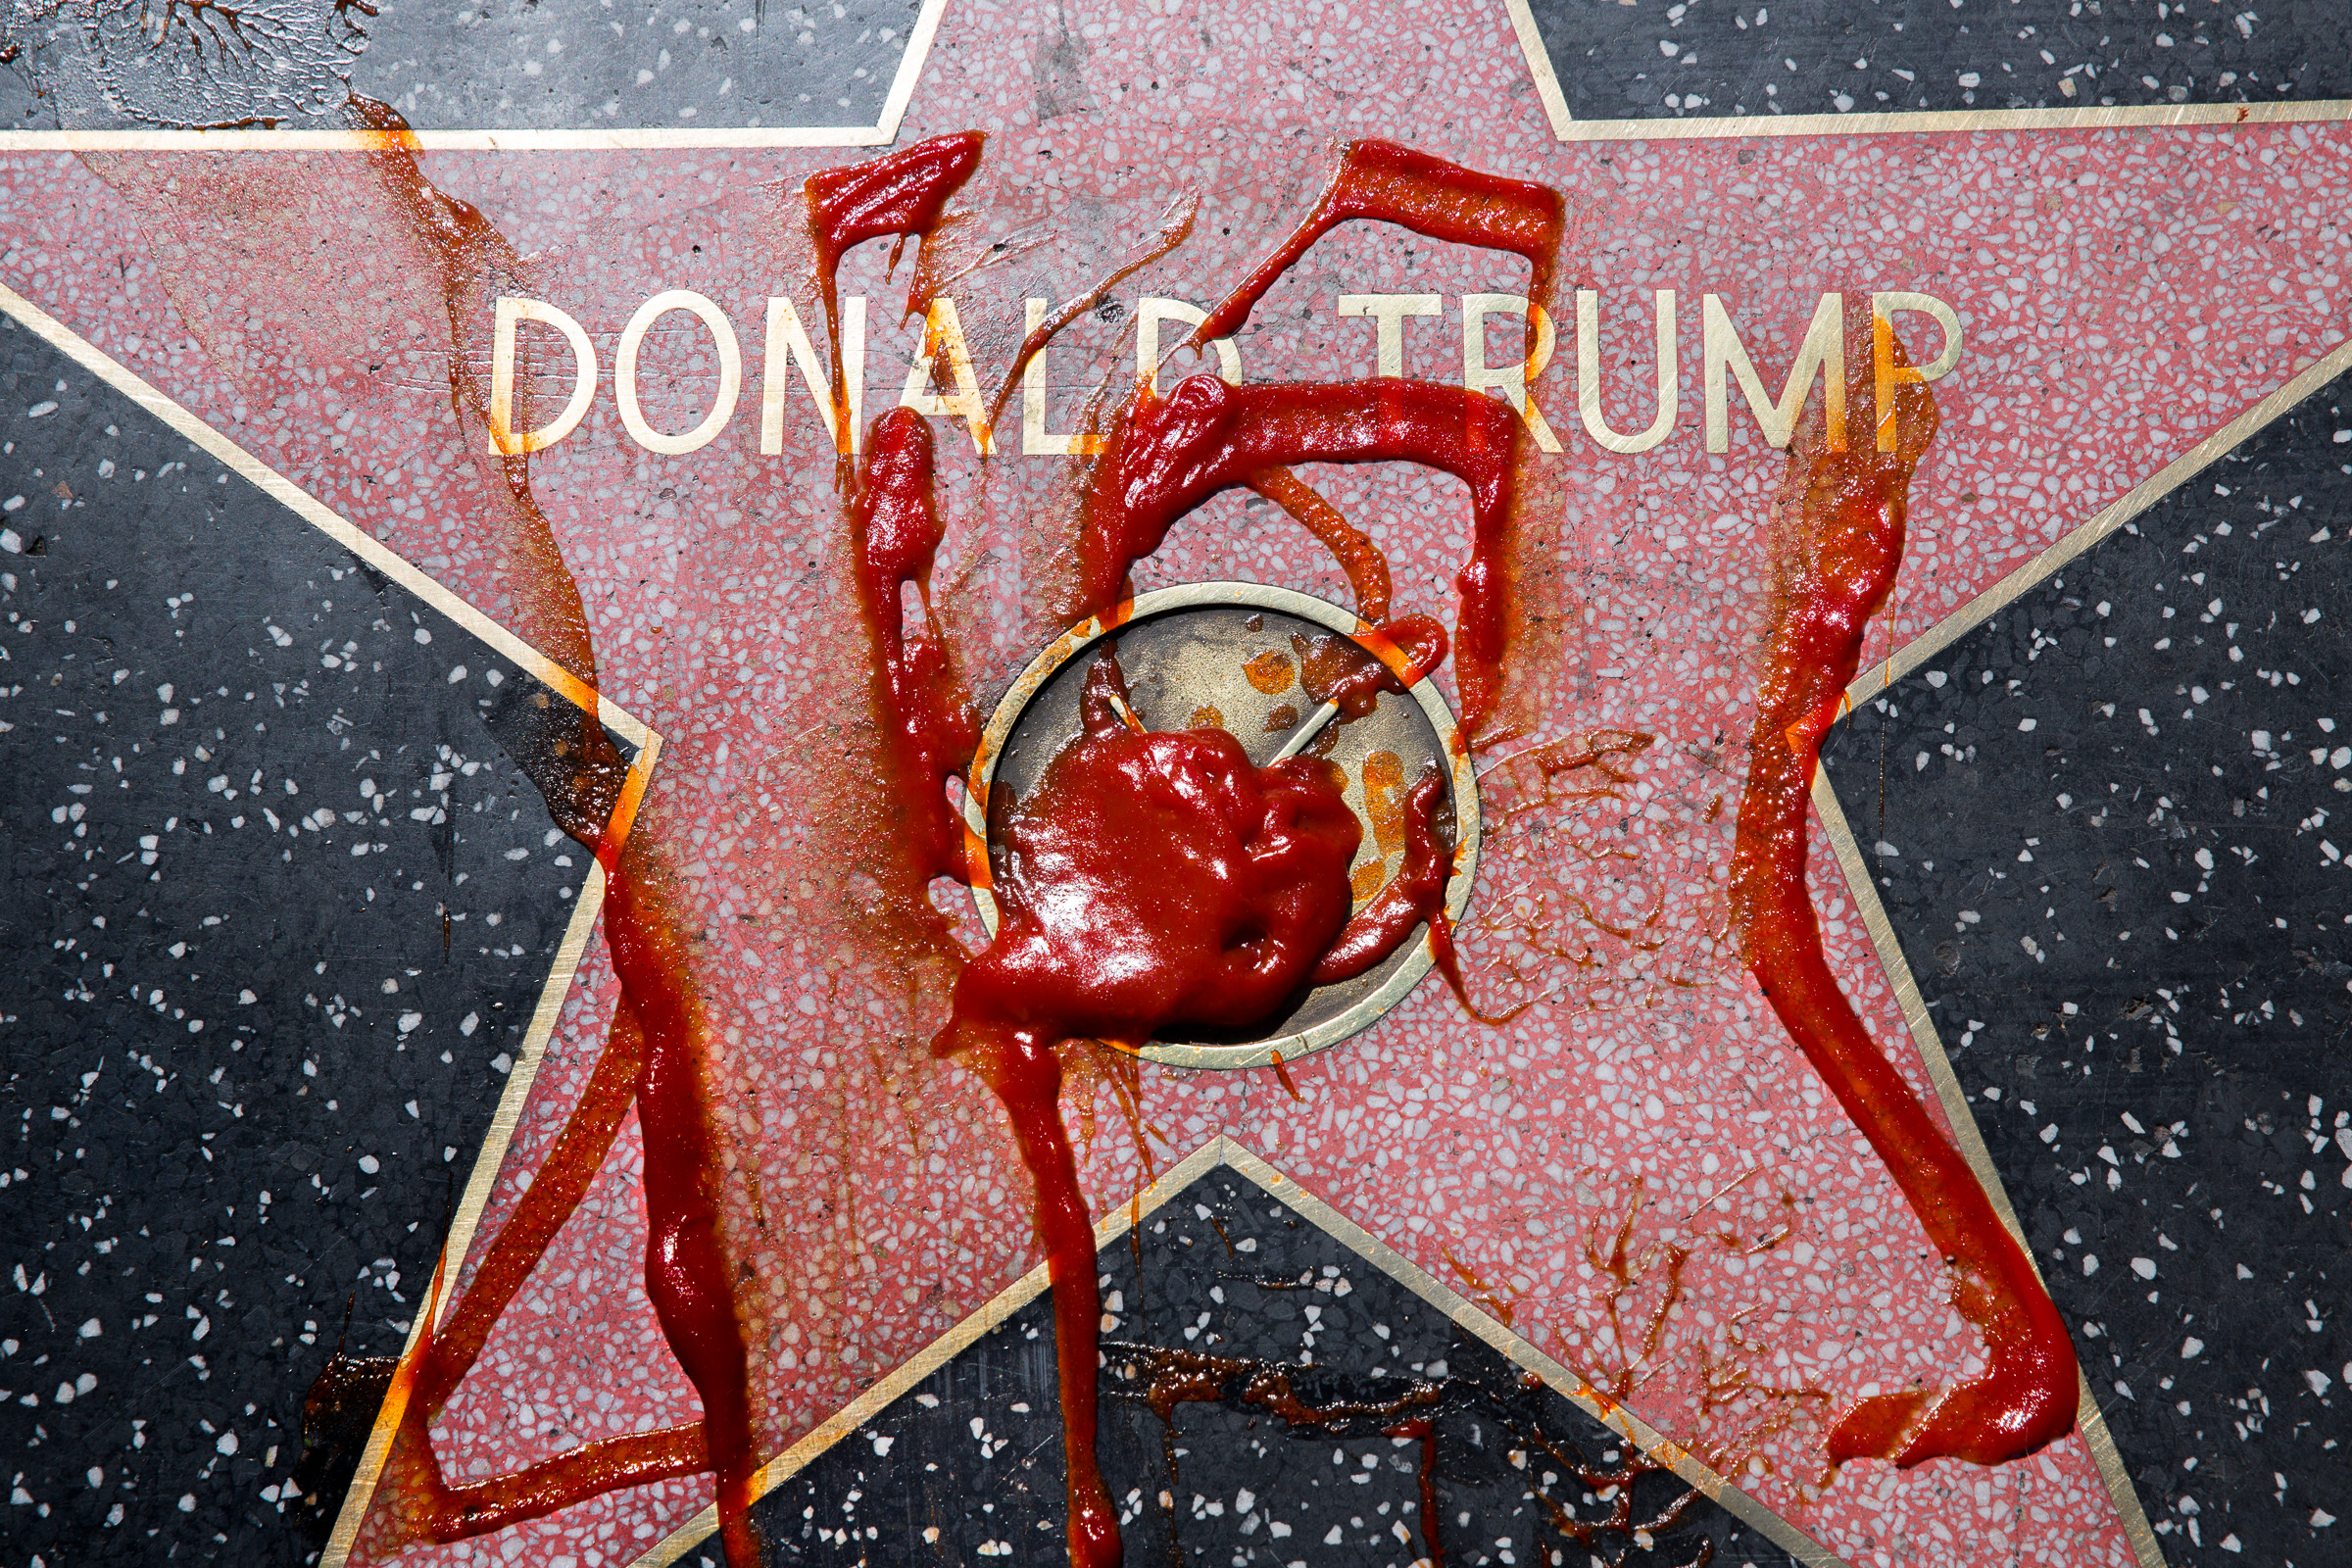 Donald_Trump_Book-digital-1.jpg